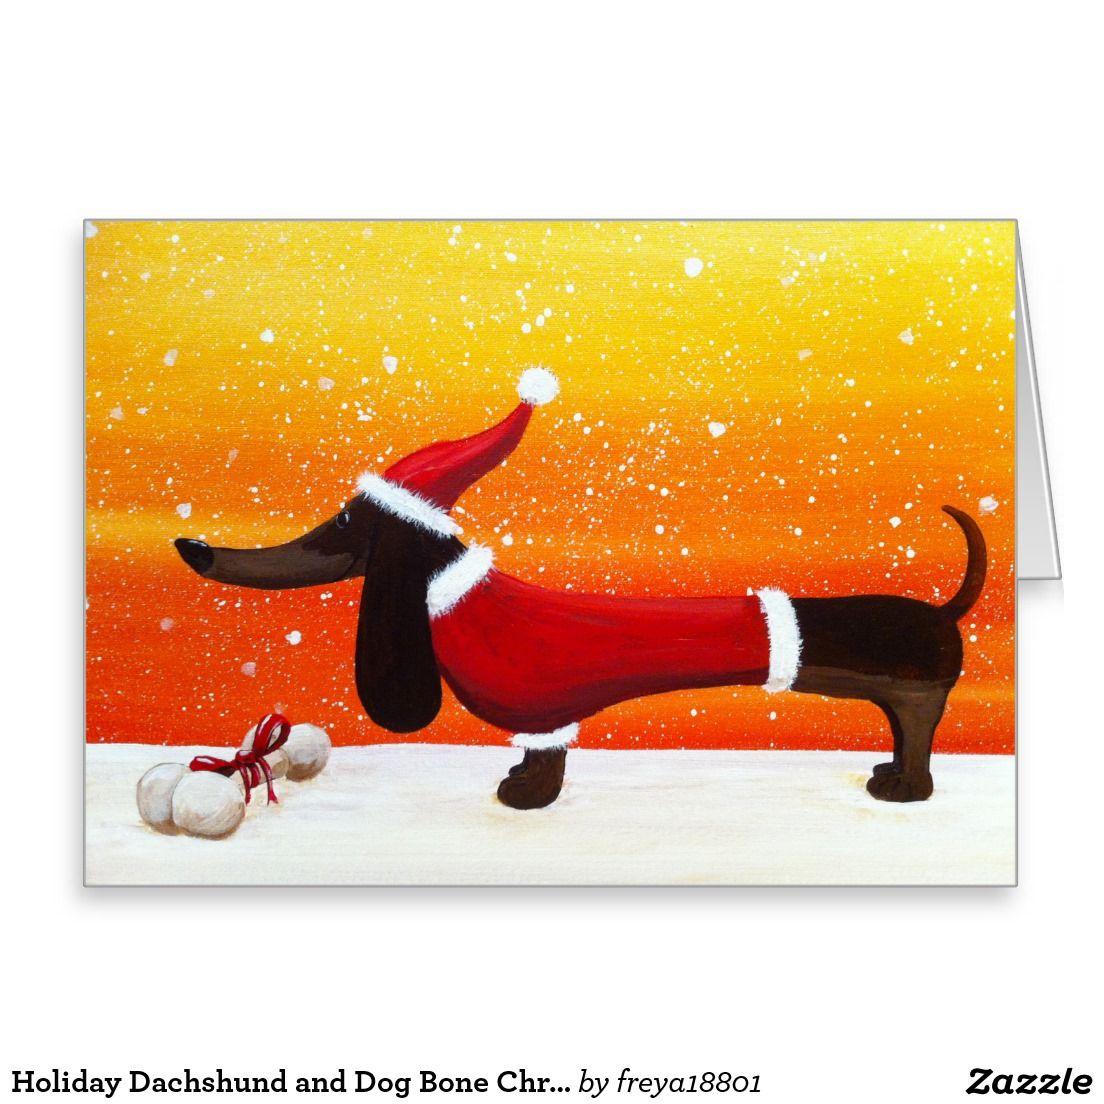 Holiday dachshund and dog bone christmas gift card dog bones dog holiday dachshund and dog bone christmas gift greeting card kristyandbryce Image collections